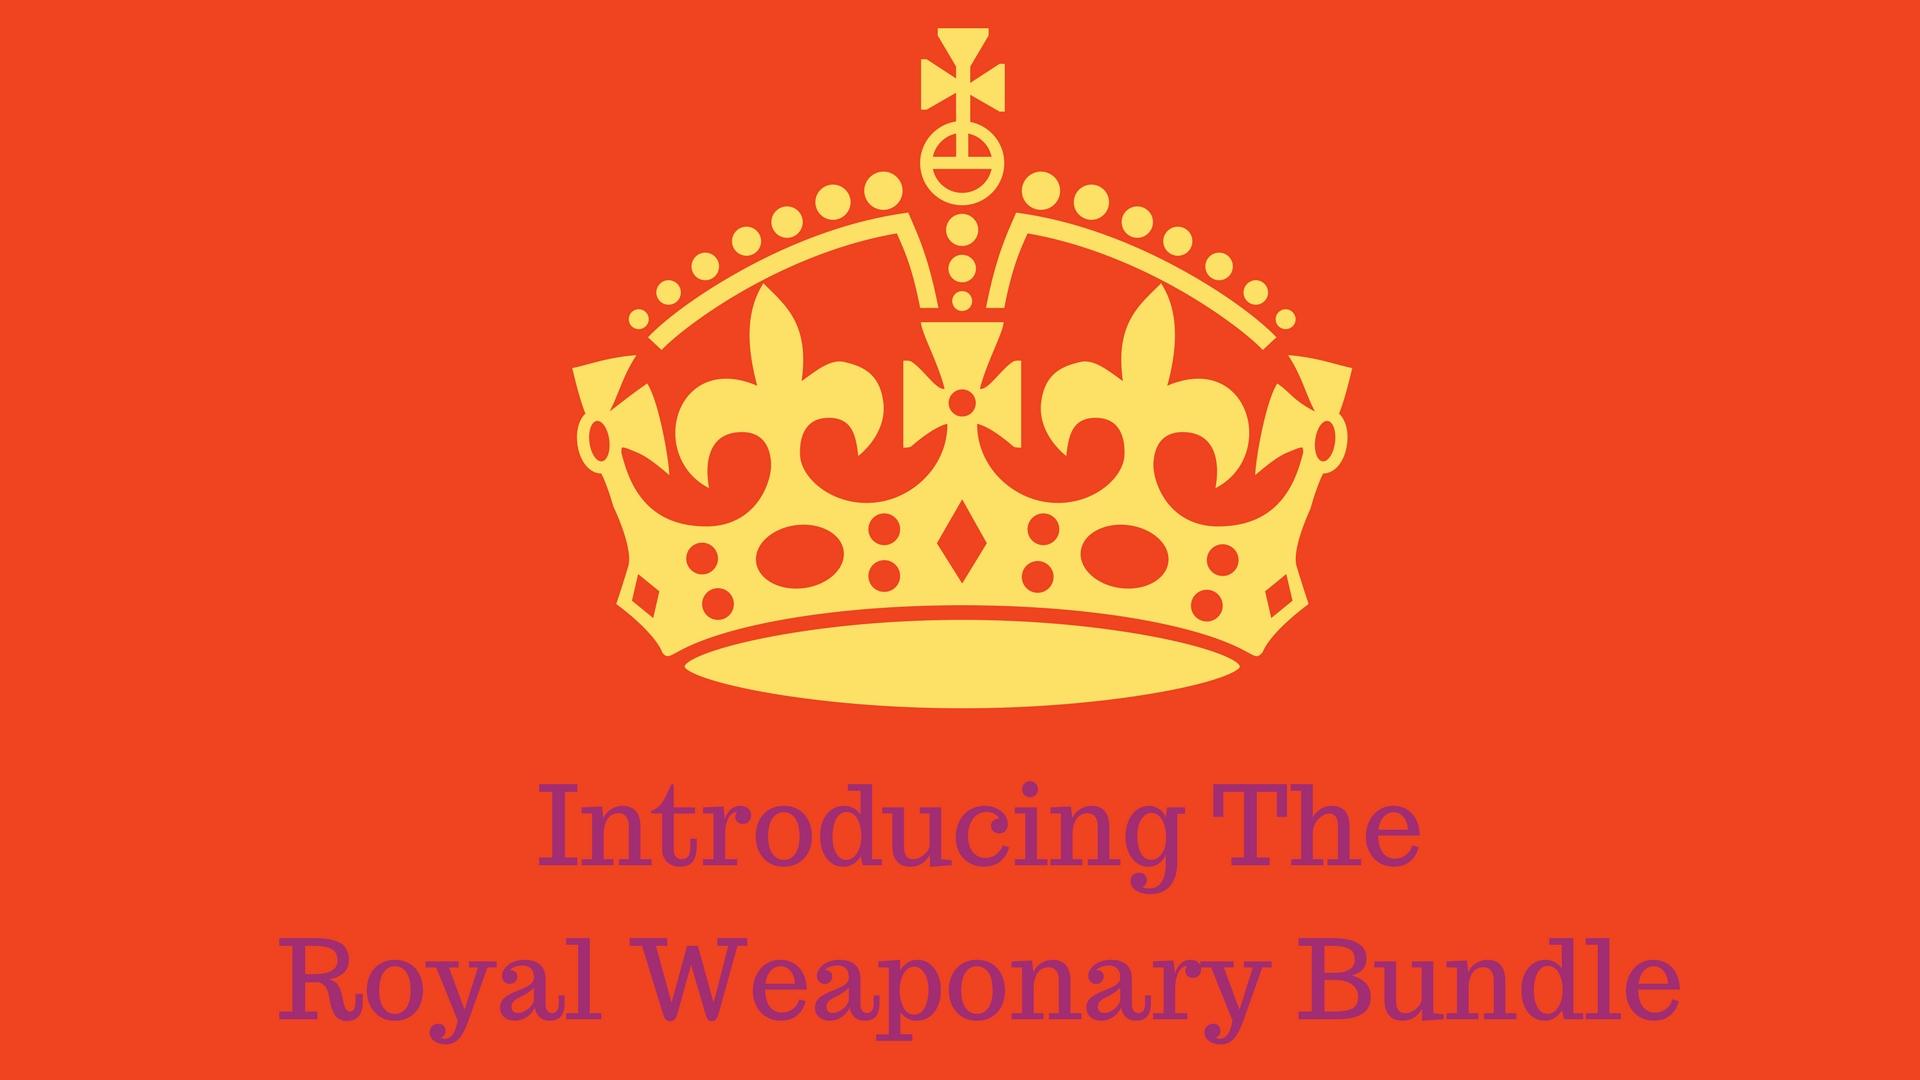 The Royal Weaponary Bundle